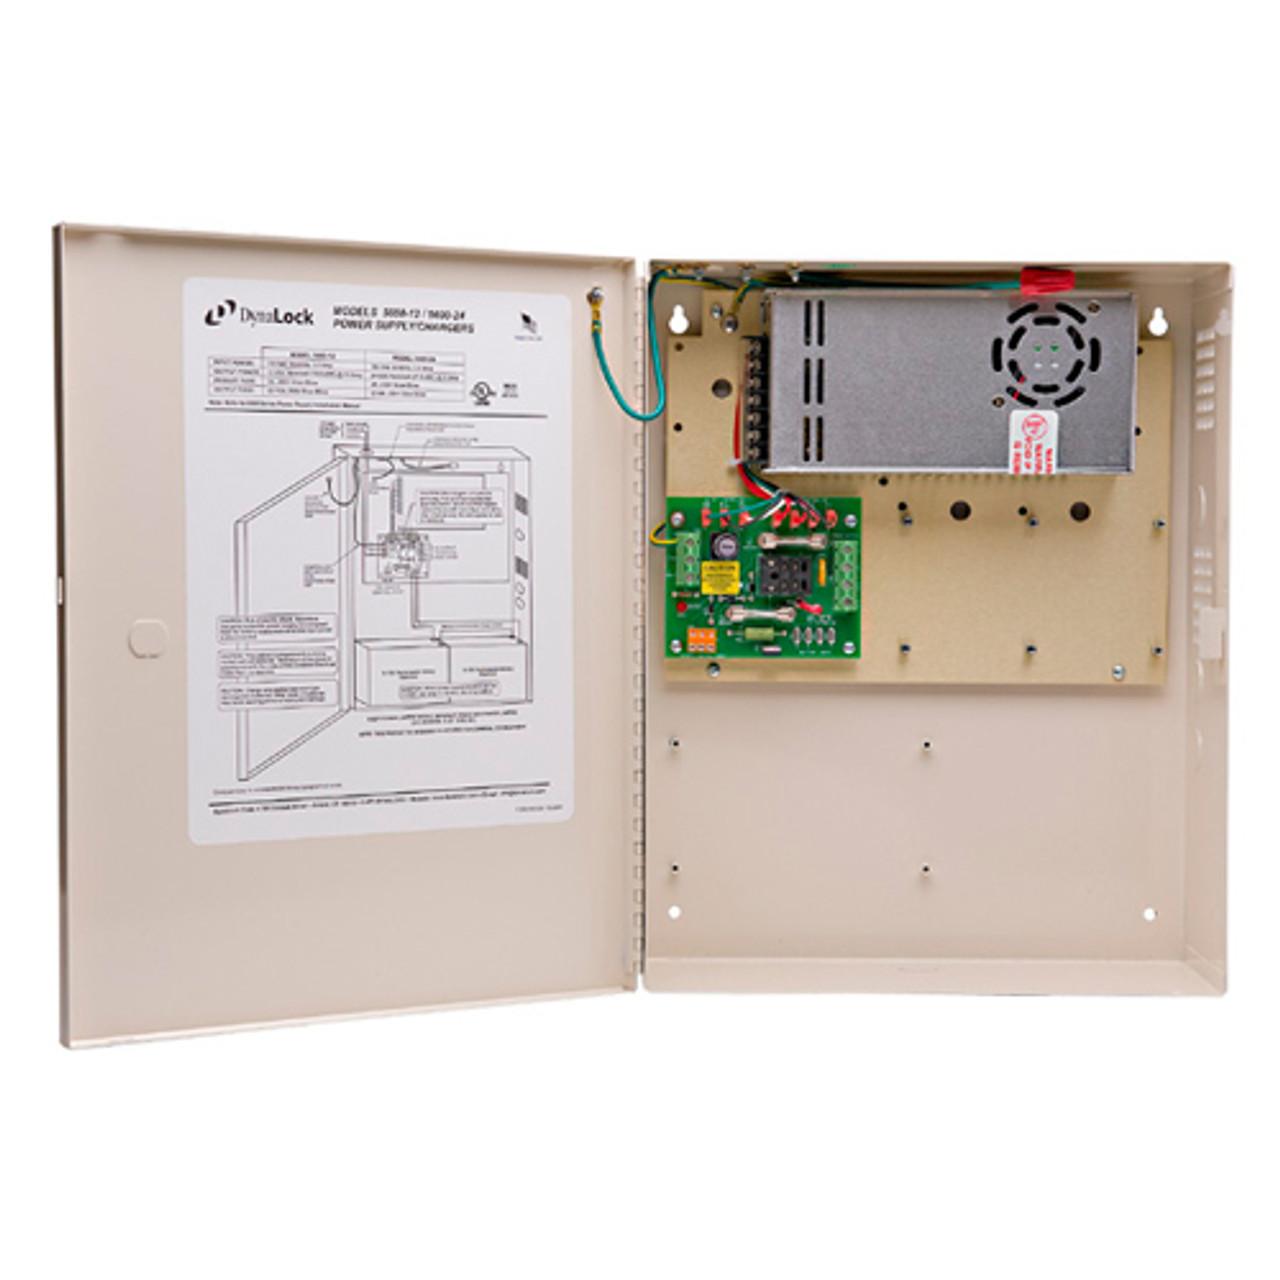 5600-12-PC DynaLock Multi Zone Heavy Duty 12 VDC Power Supply with Power Cord